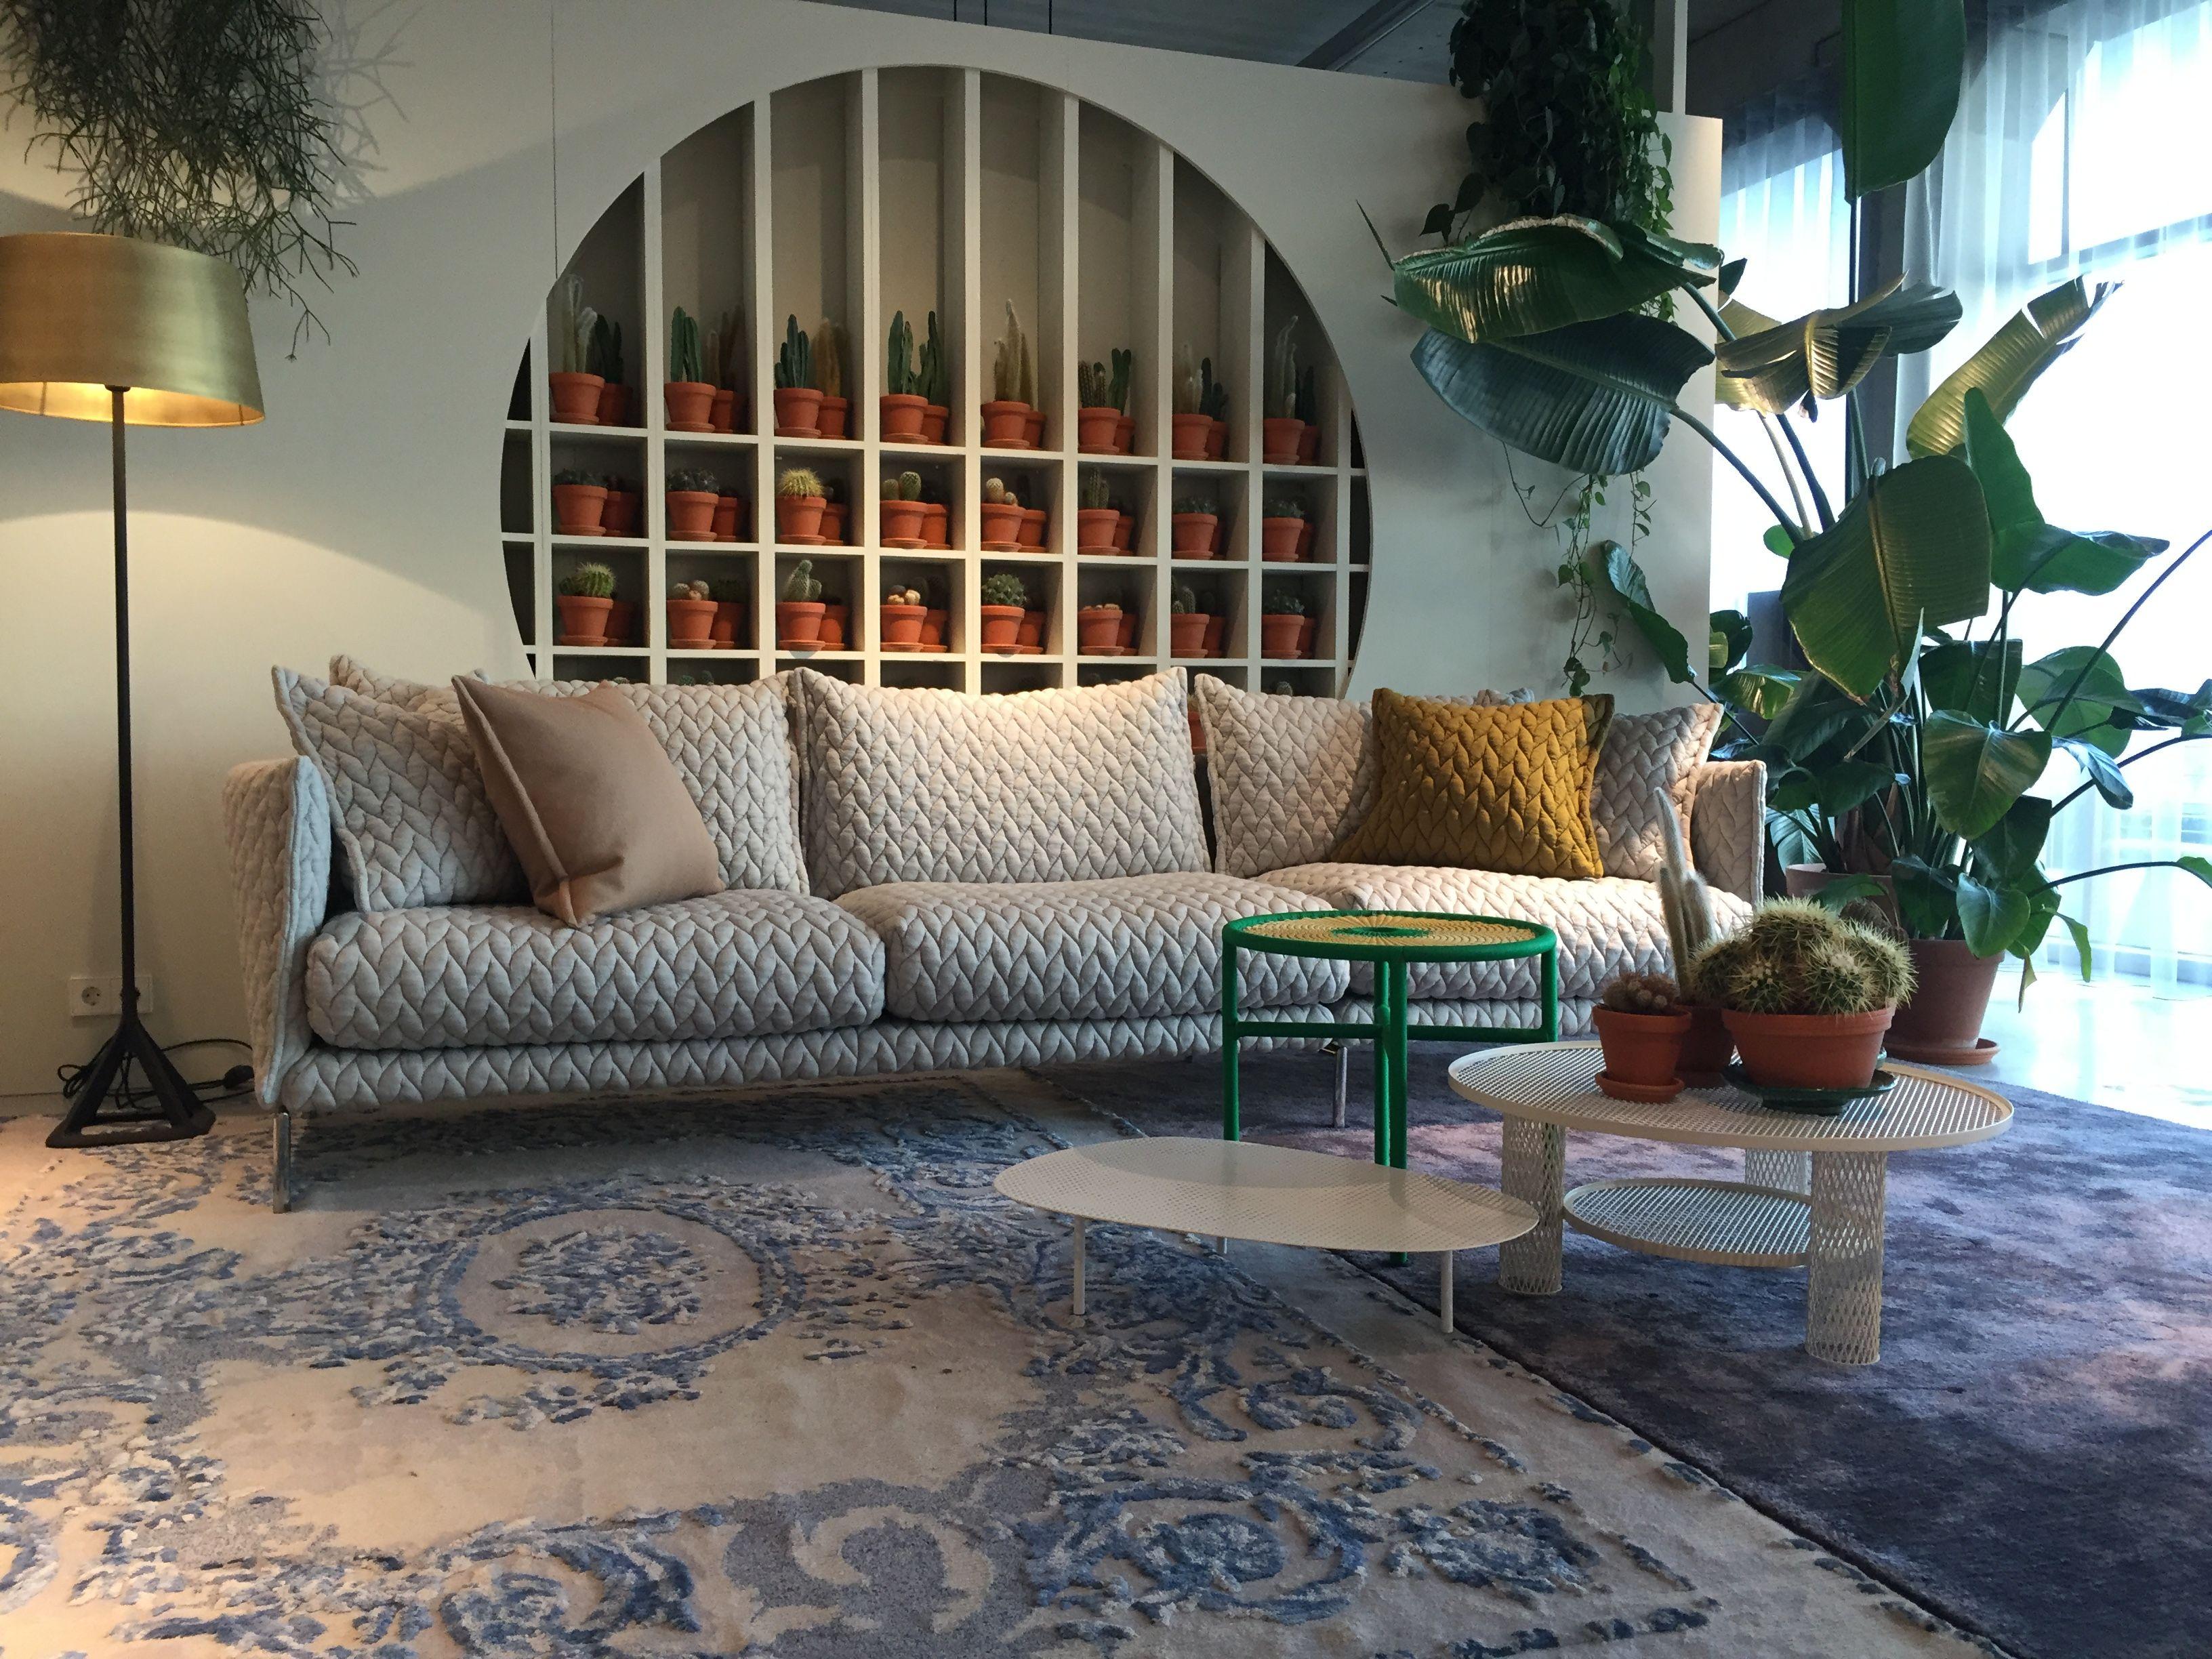 Moroso showroom Amsterdam Gentry sofa in Febrik stof